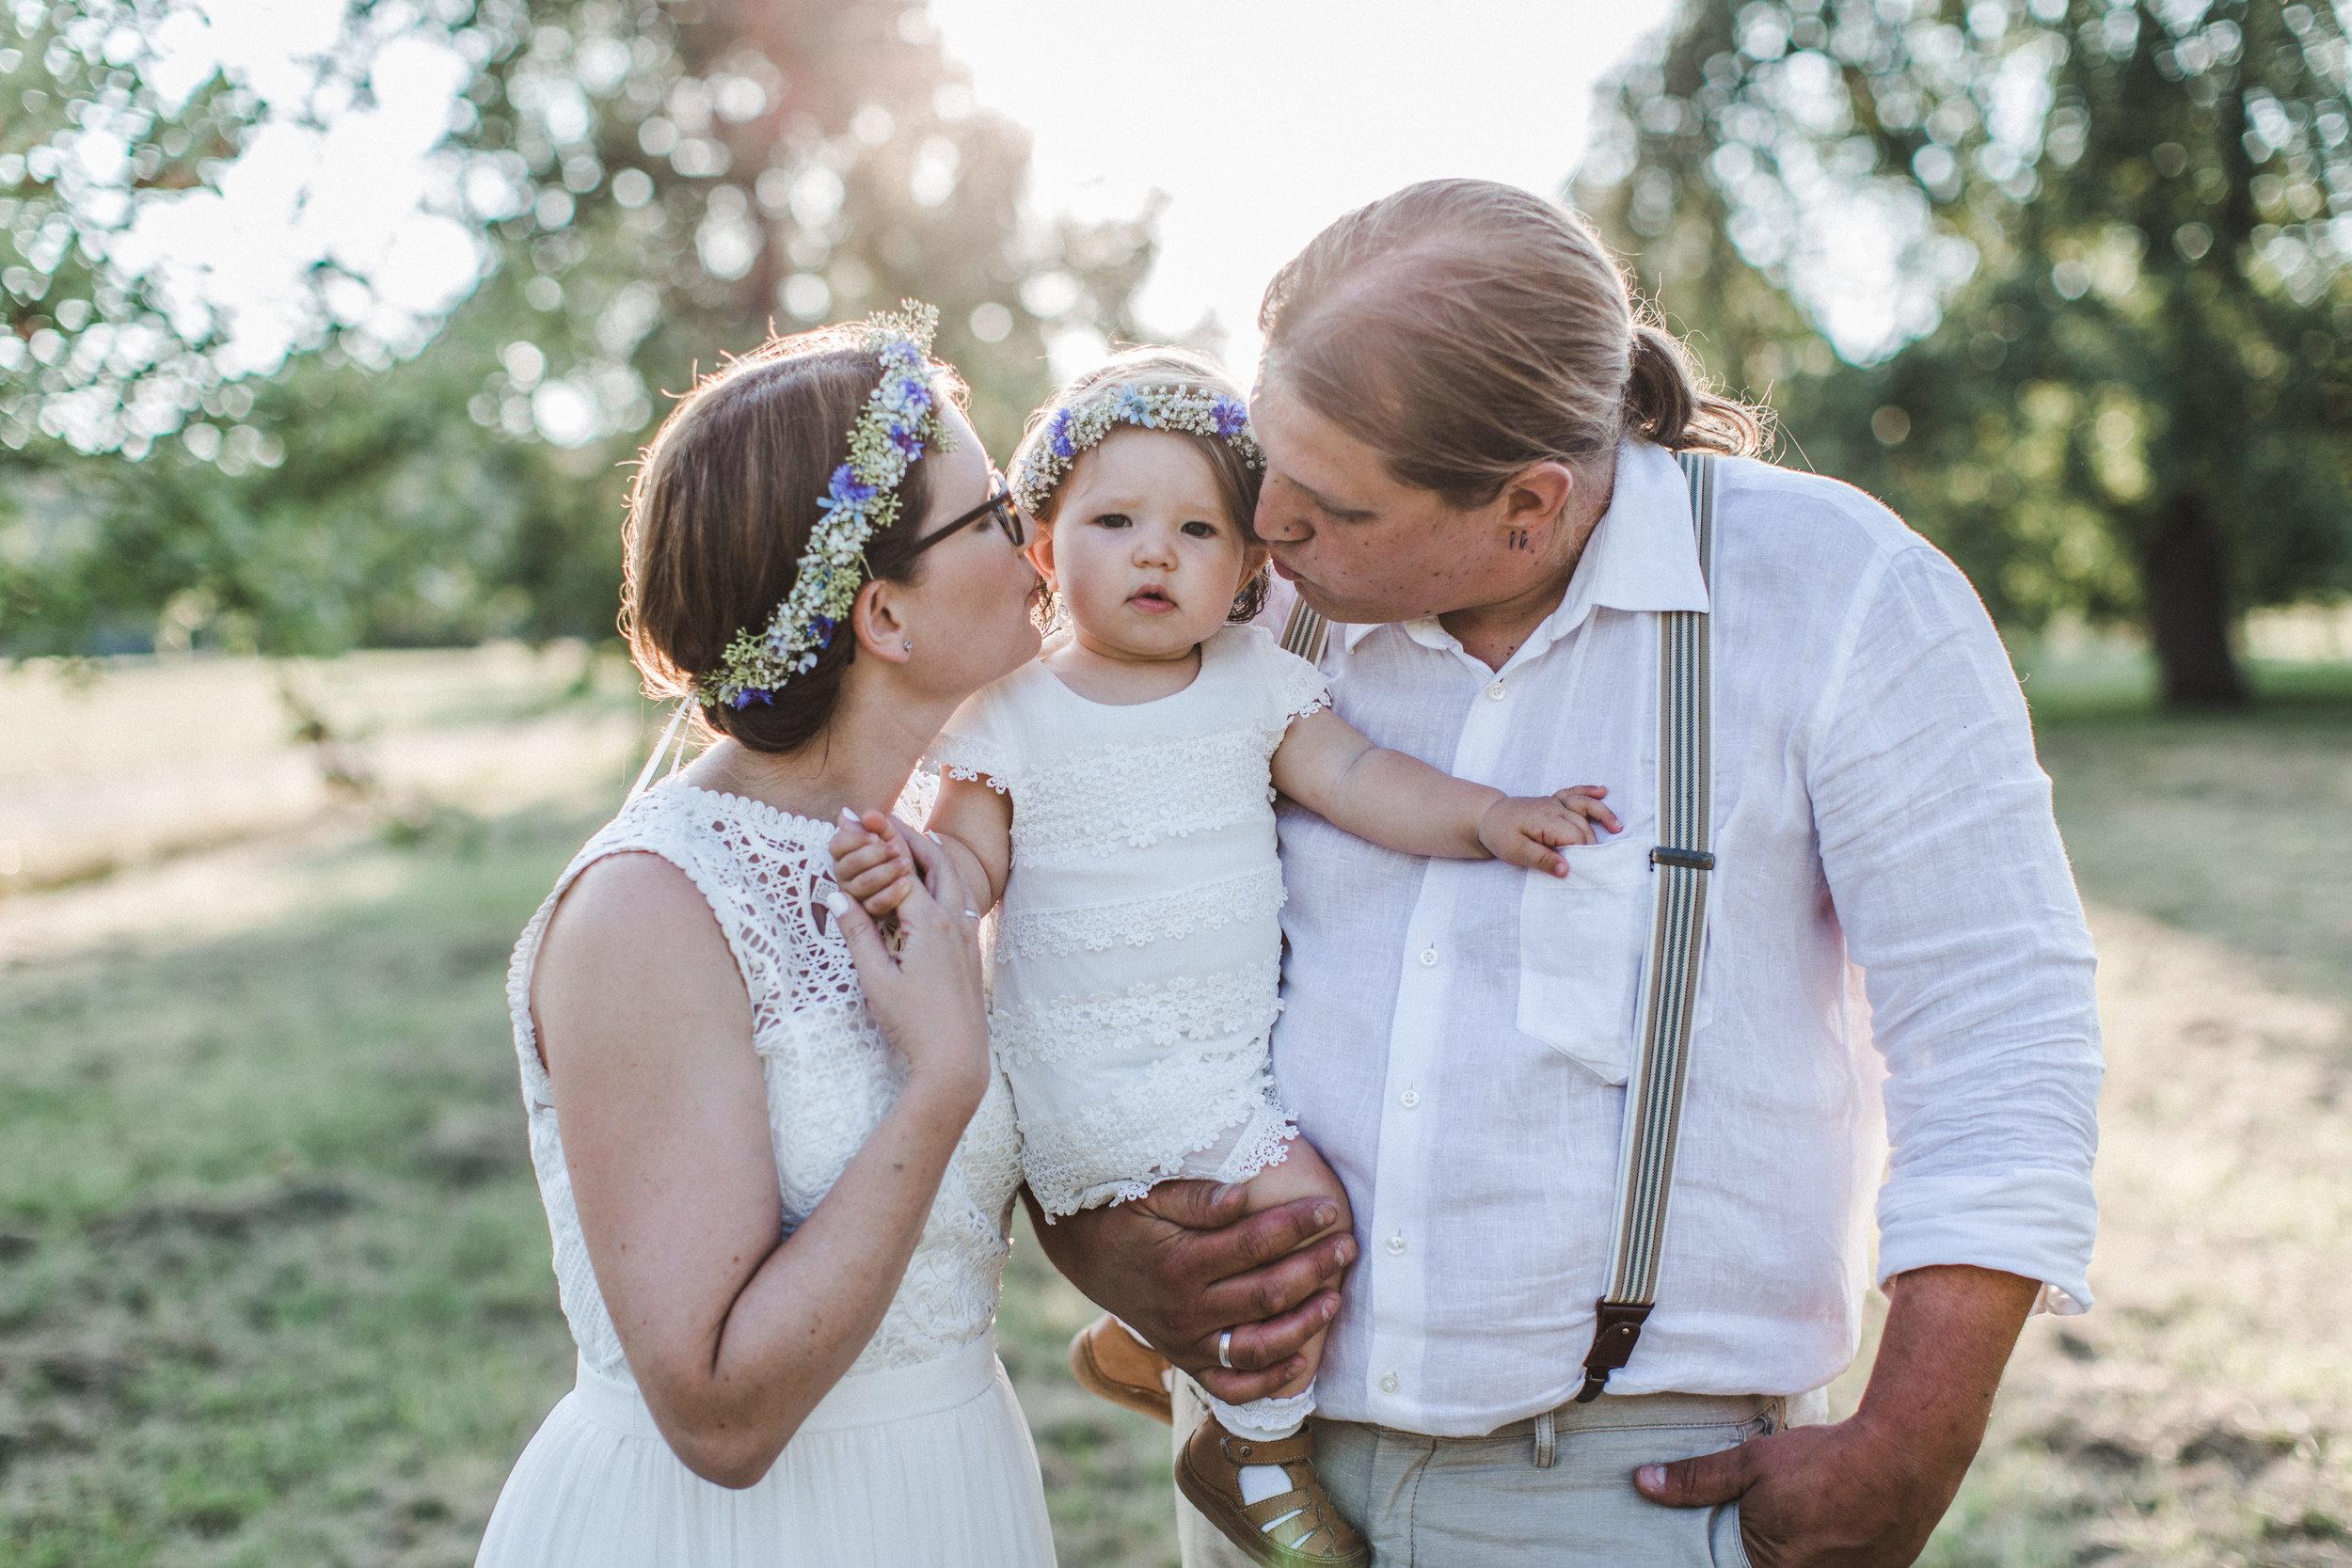 yessica-baur-fotografie-after-wedding-tübingen-066-9546.JPG